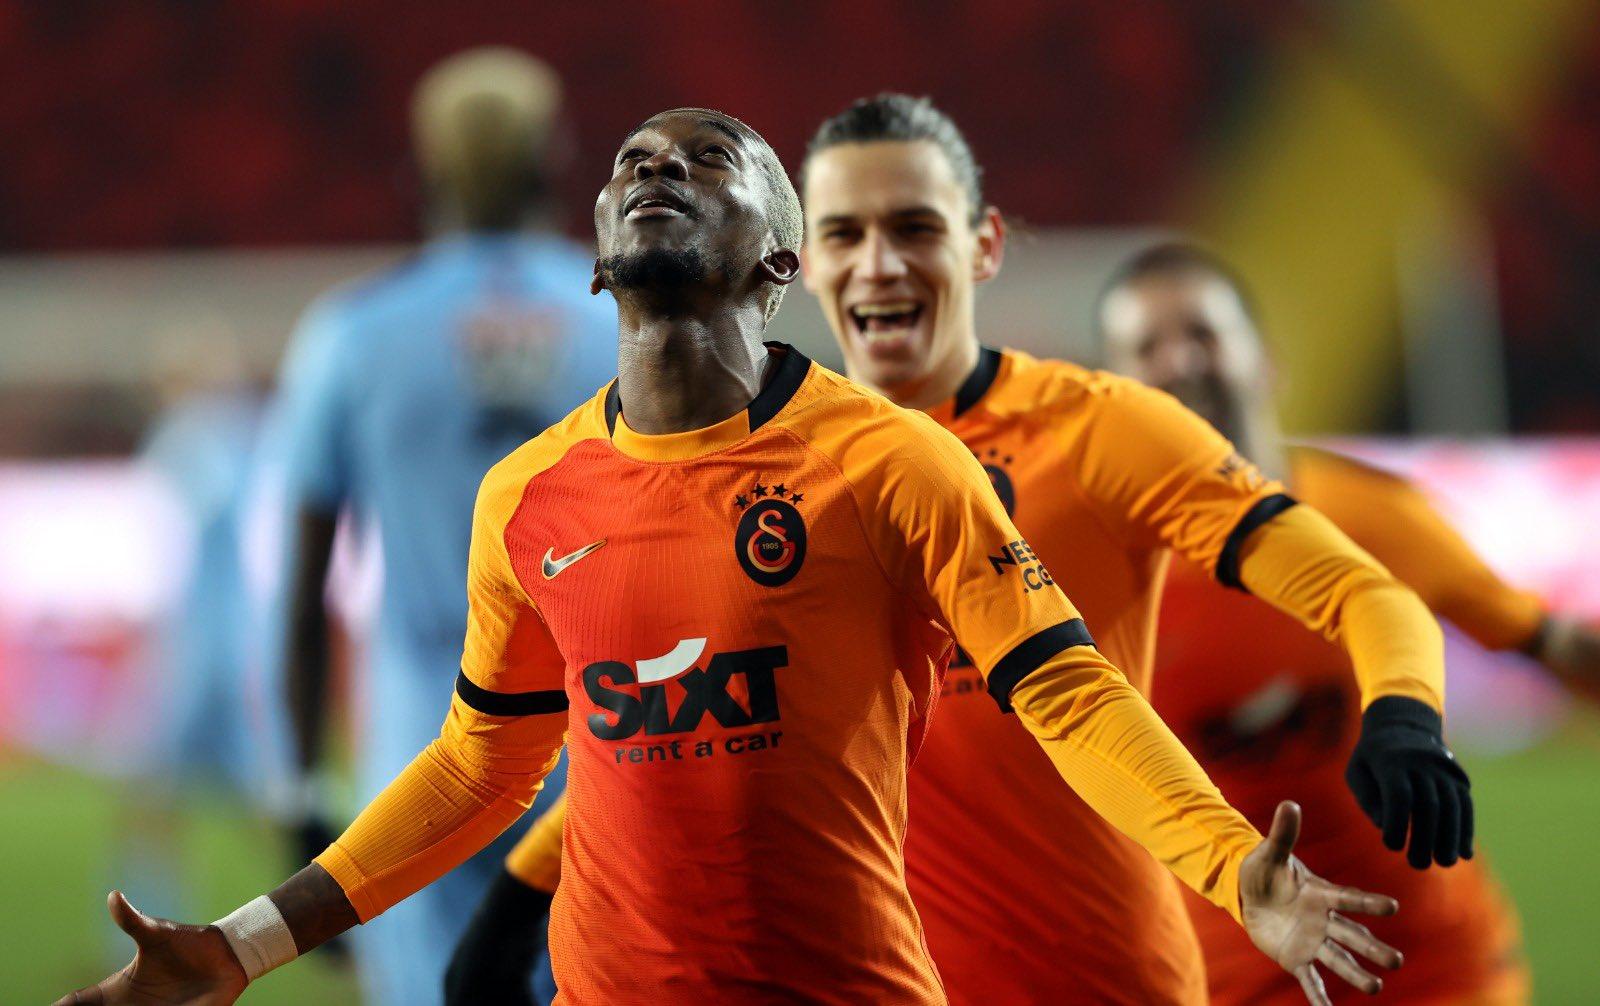 Onyekuru pleased with his brace for Galatasaray against Gaziantep